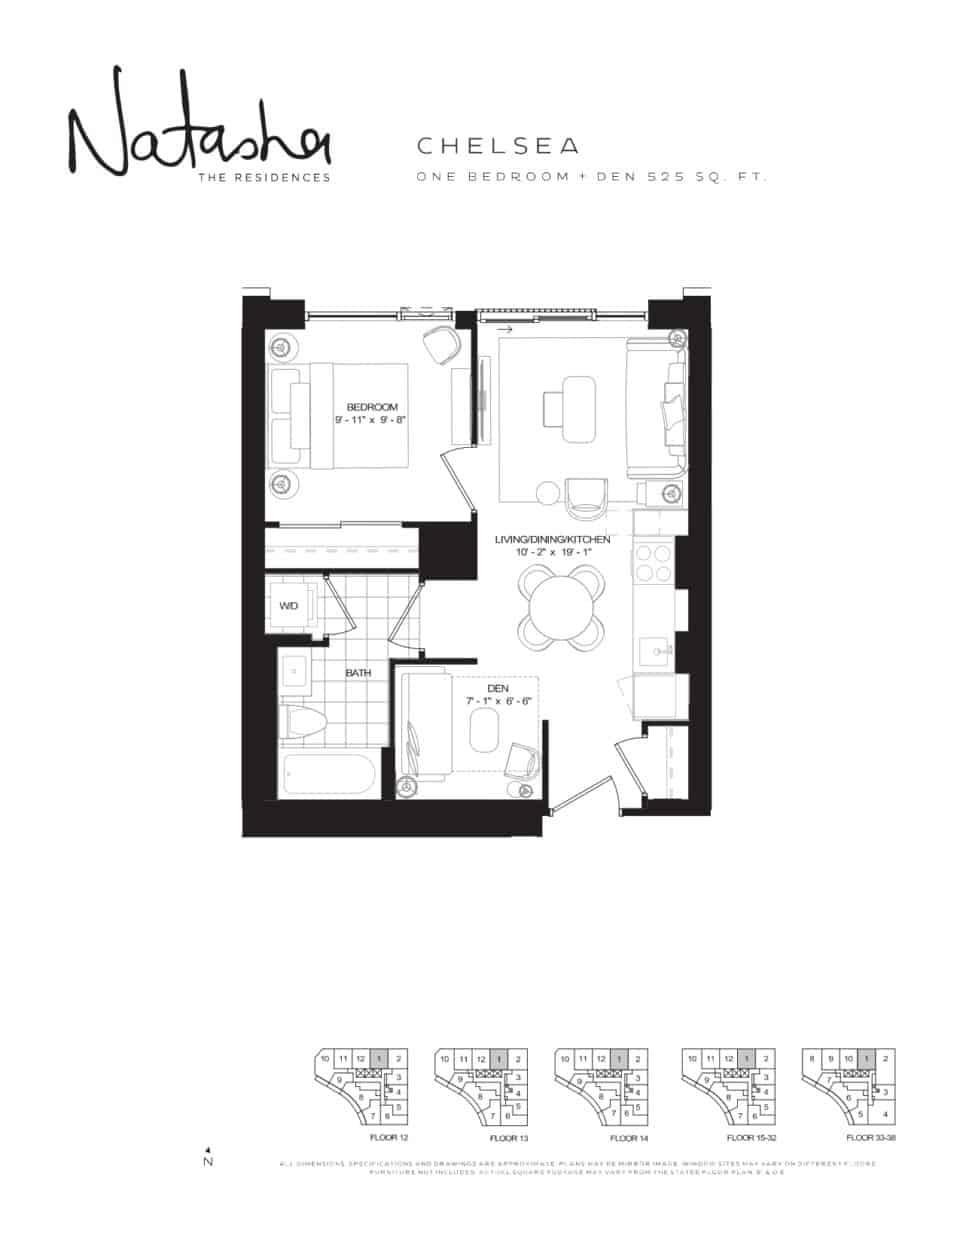 2021 09 02 11 02 03 natashatheresidences lanterradevelopments floorplans chelsea